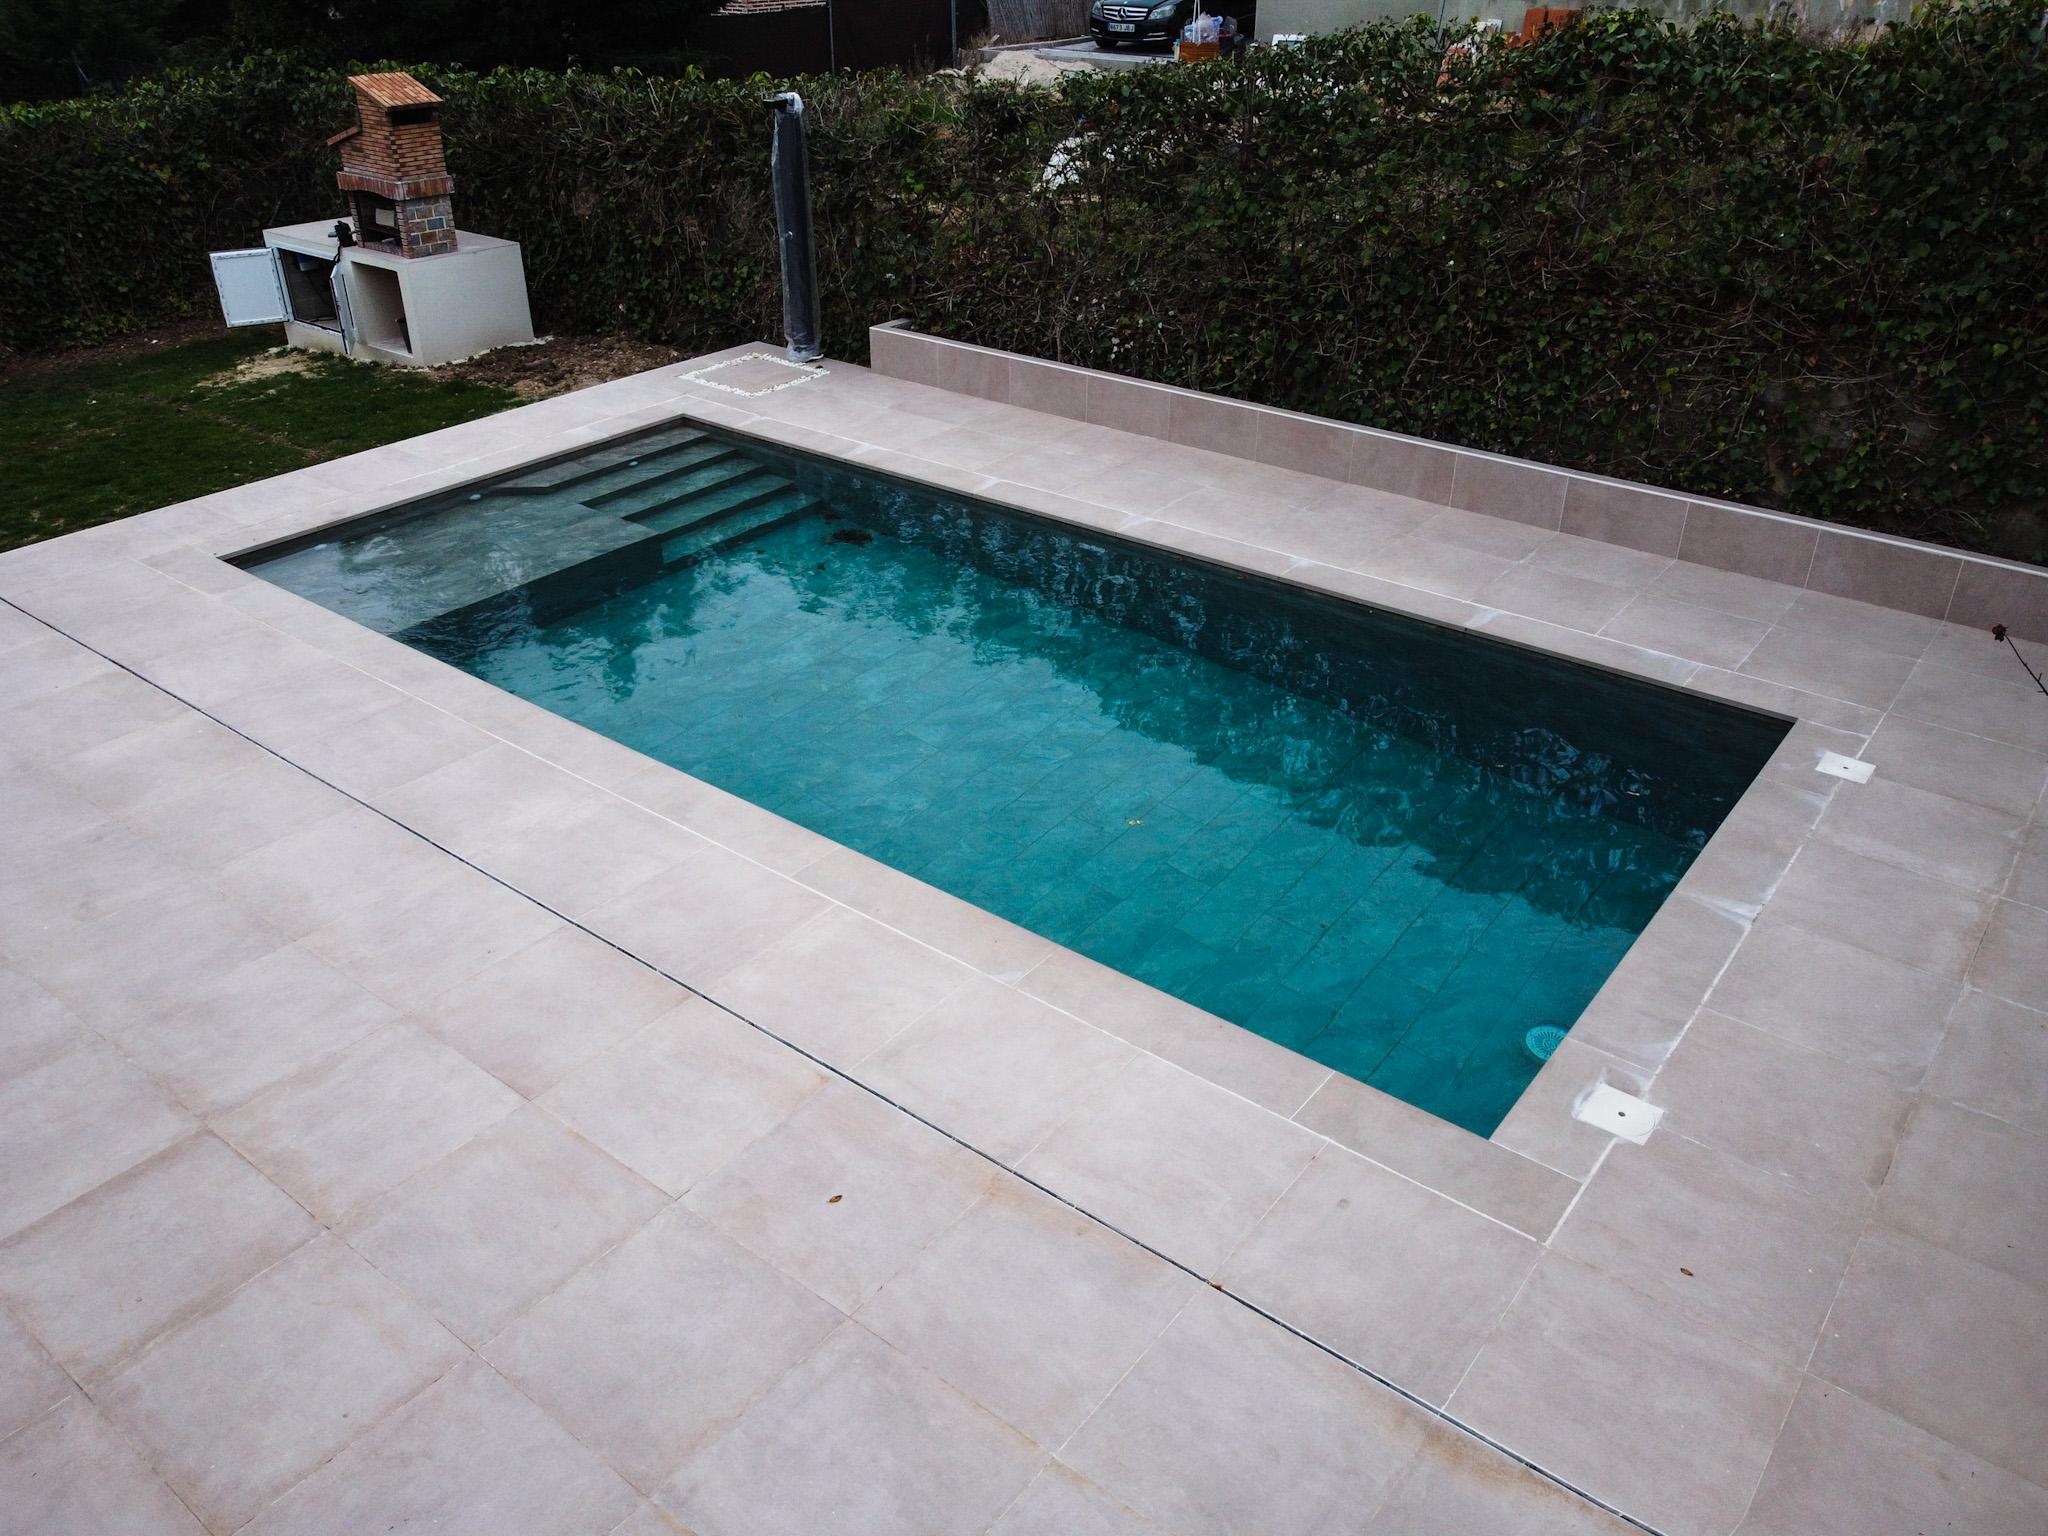 Caseta de obra junto a piscina